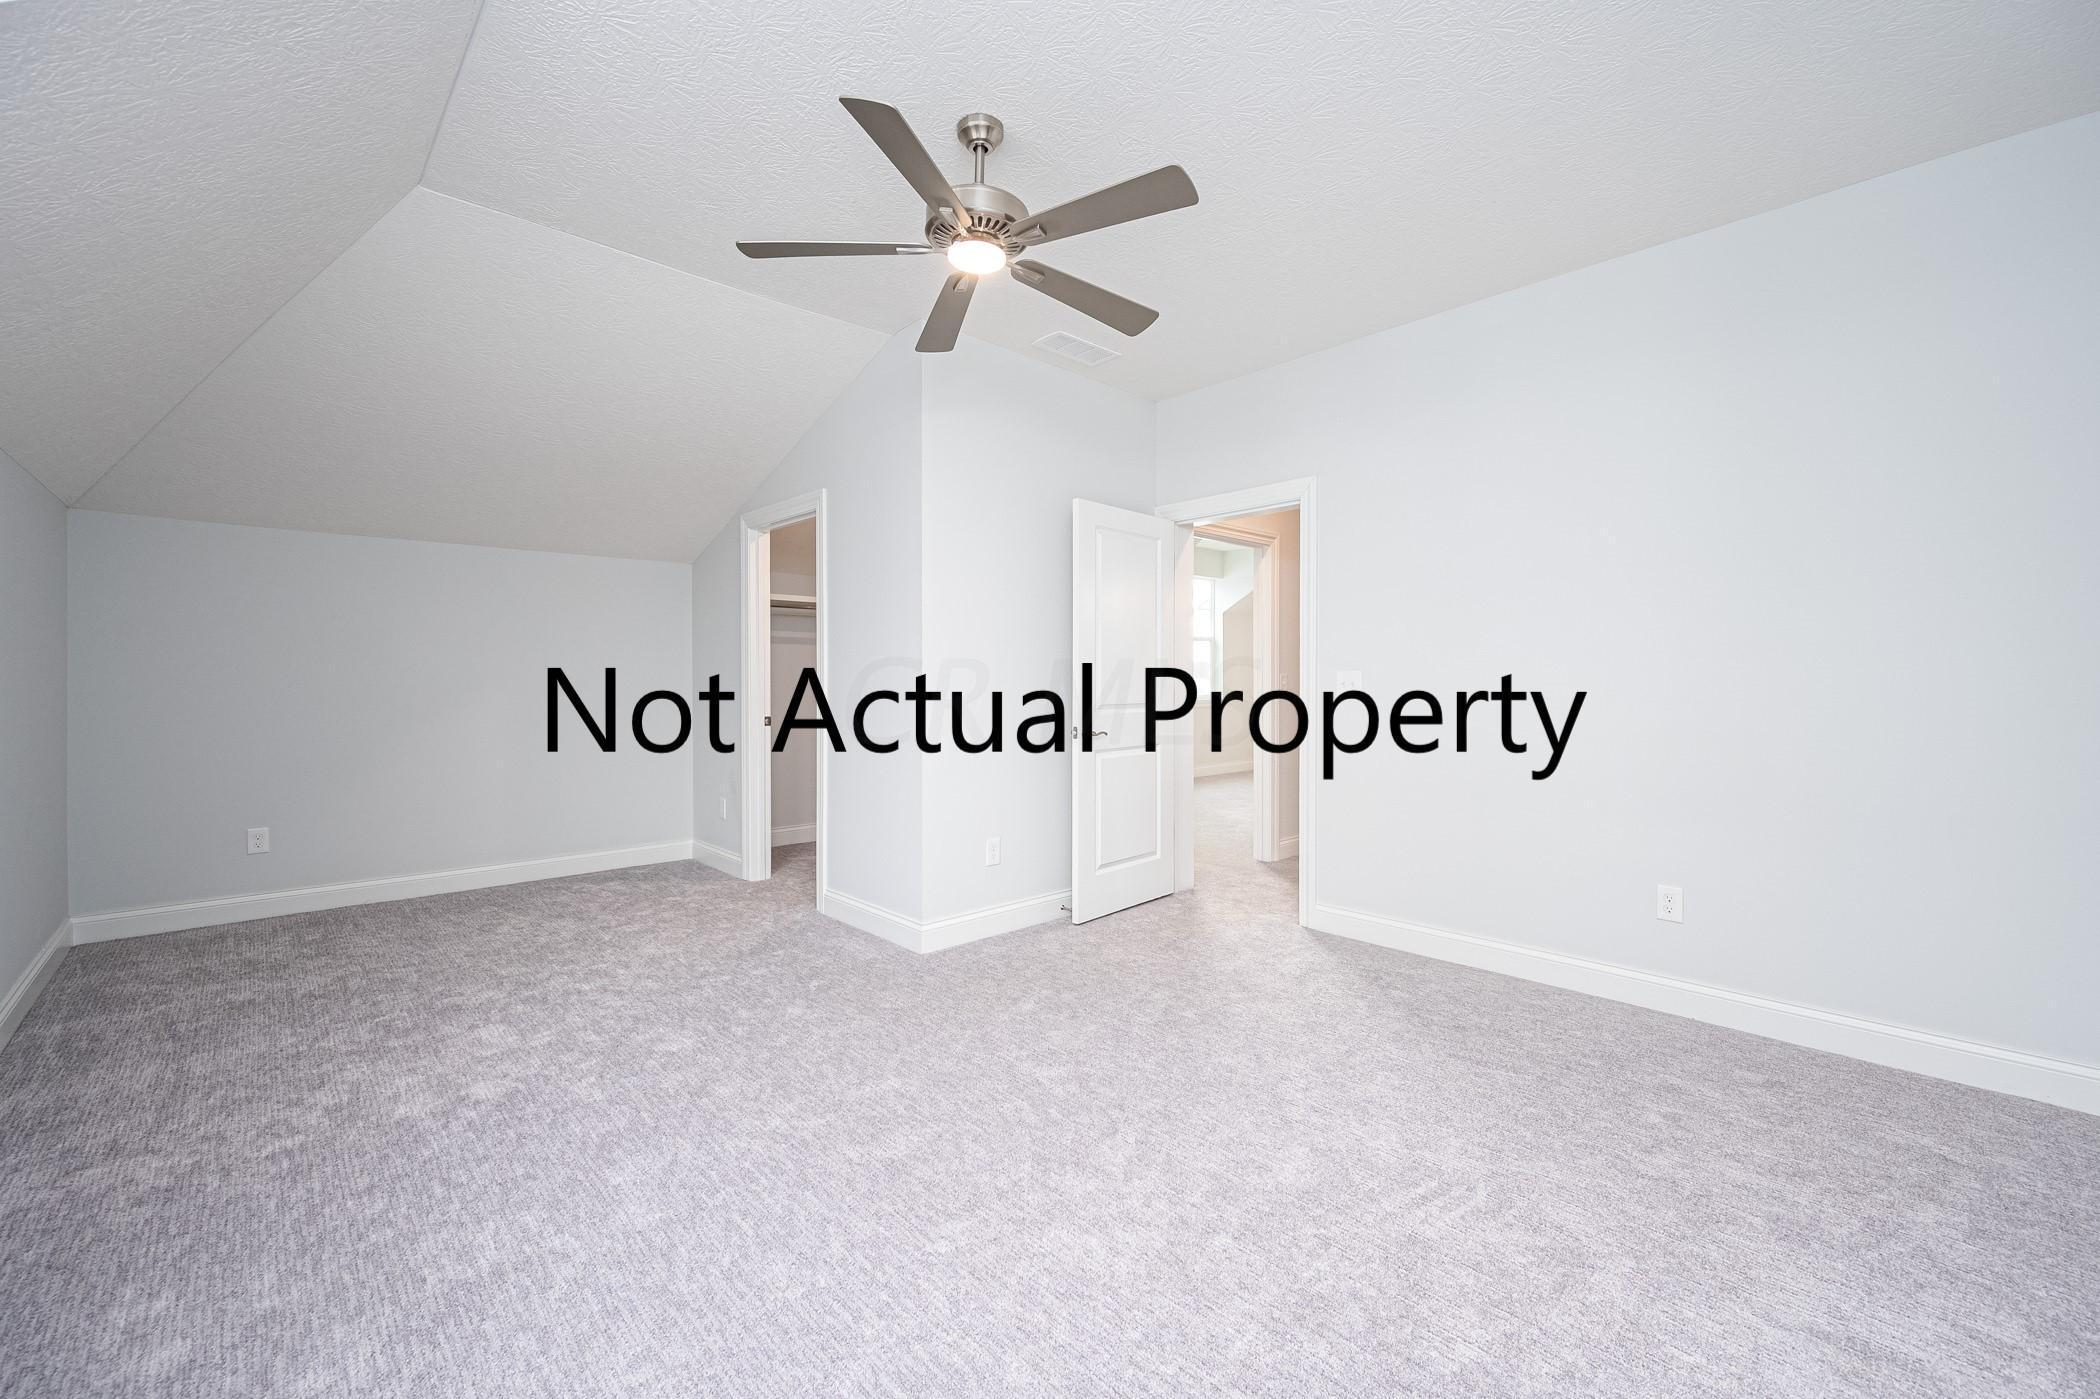 Viptual 2nd Bedroom with Walkin Closet